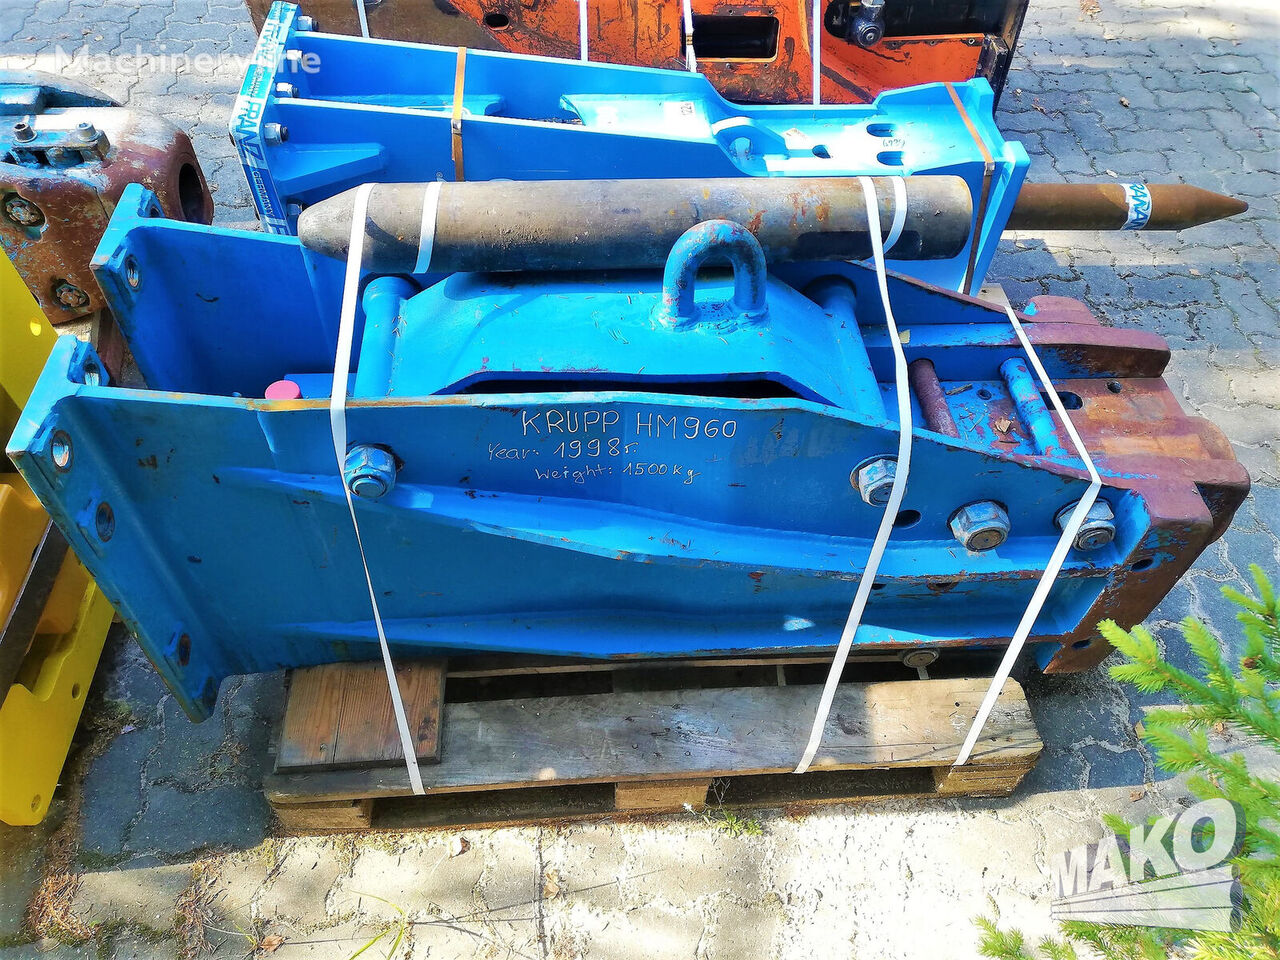 KRUPP HM 951 960 hidrauliskais āmurs